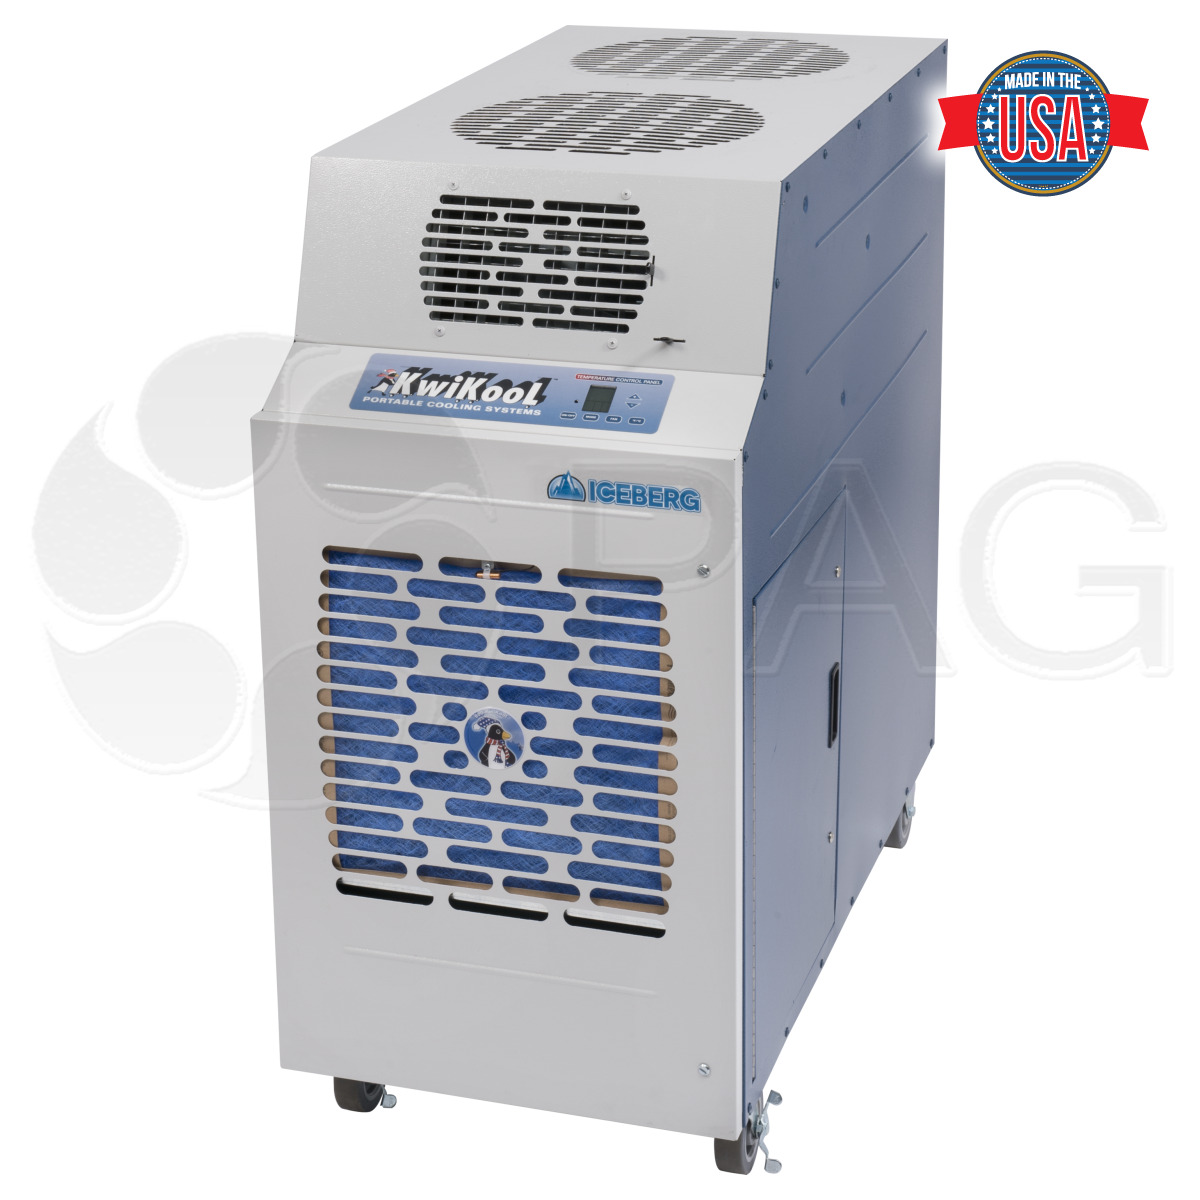 KwiKool KIB2421 portable air conditioner